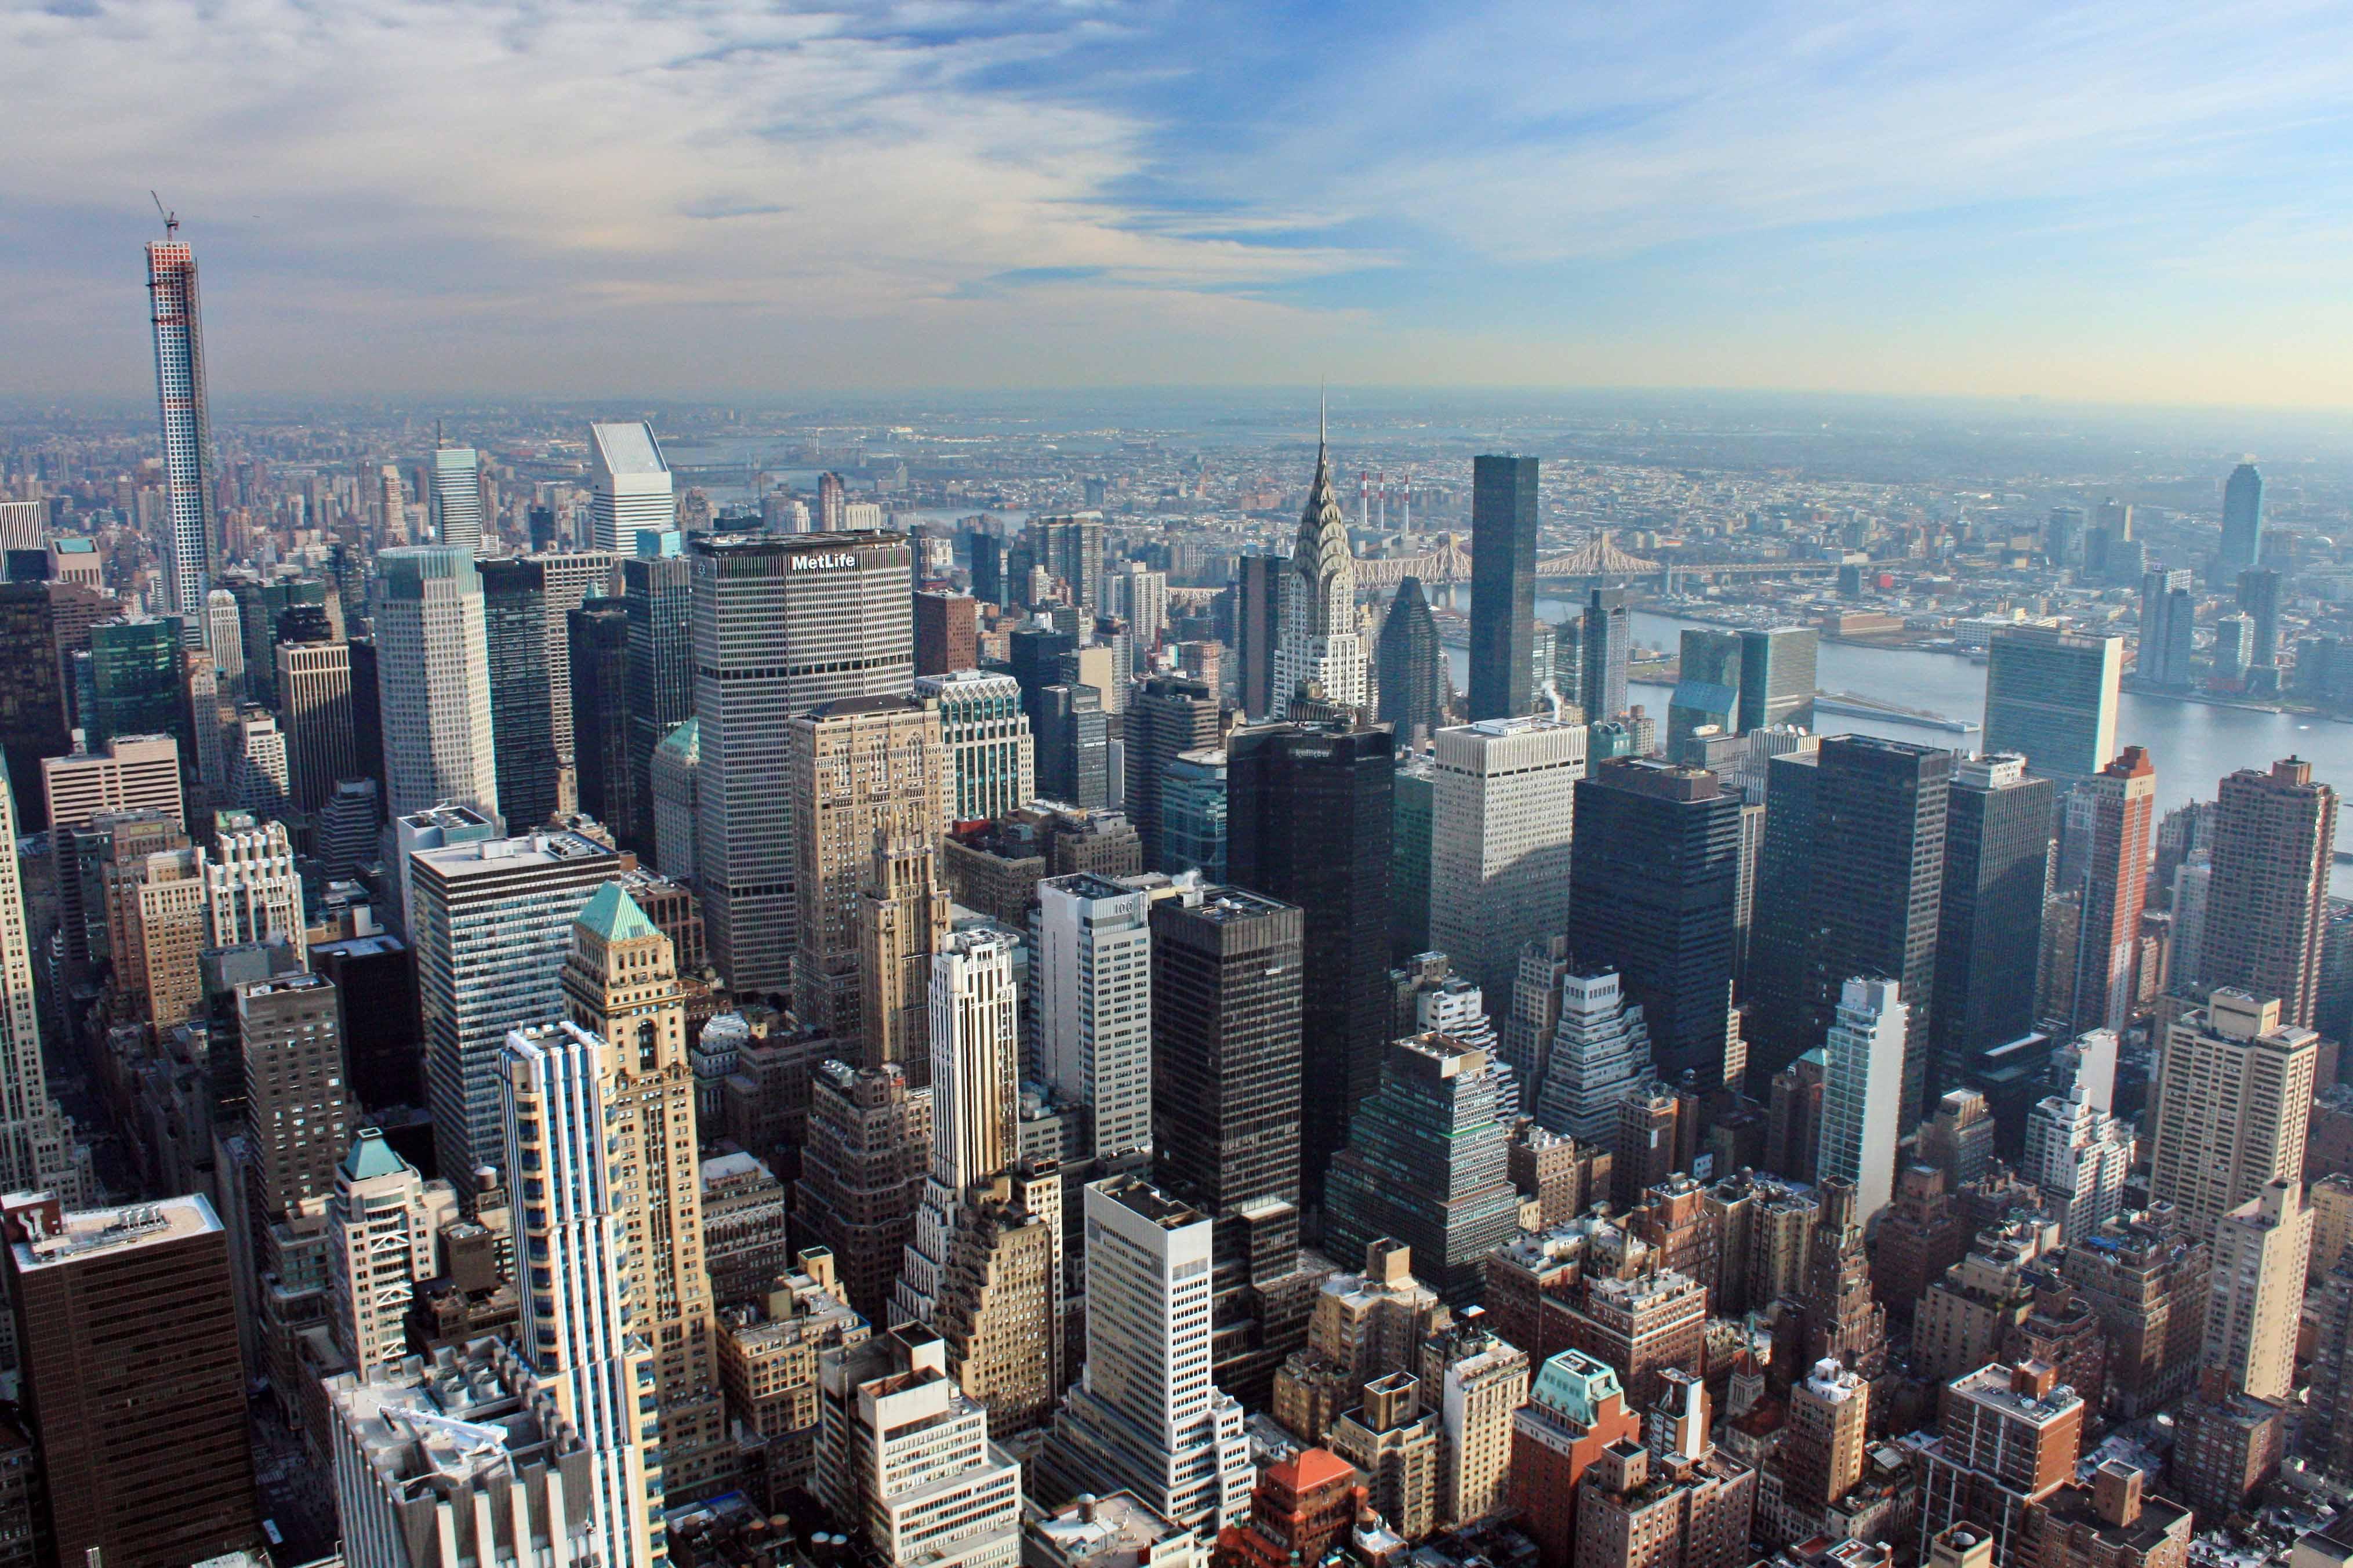 New York Weihnachten.Christmas In New York Weihnachten Www Beautybutterflies De